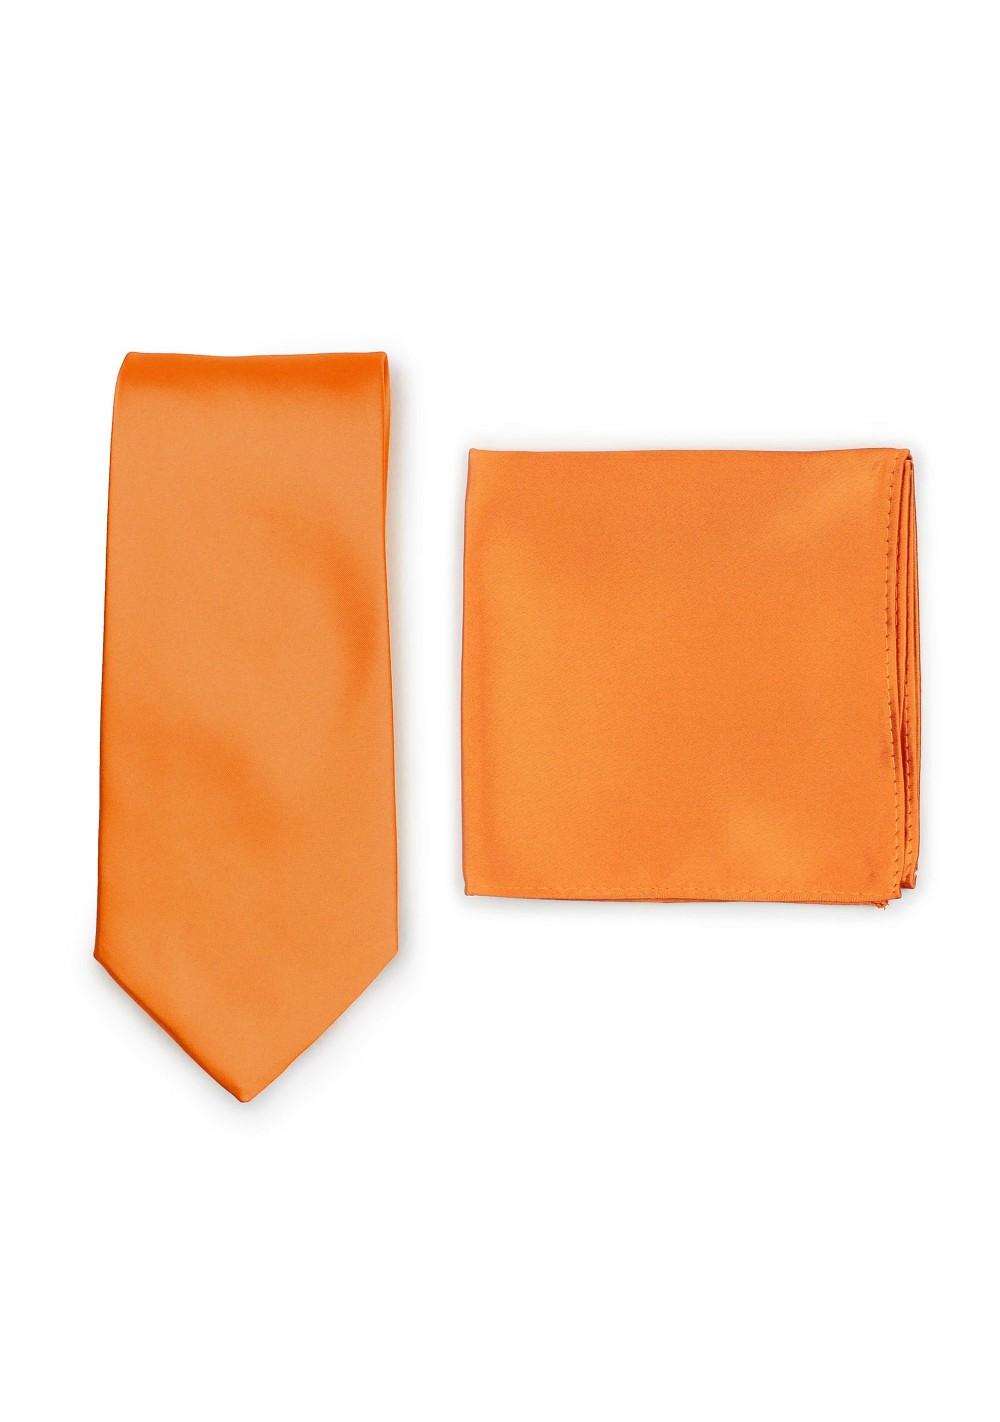 Persimmon Orange Necktie Set